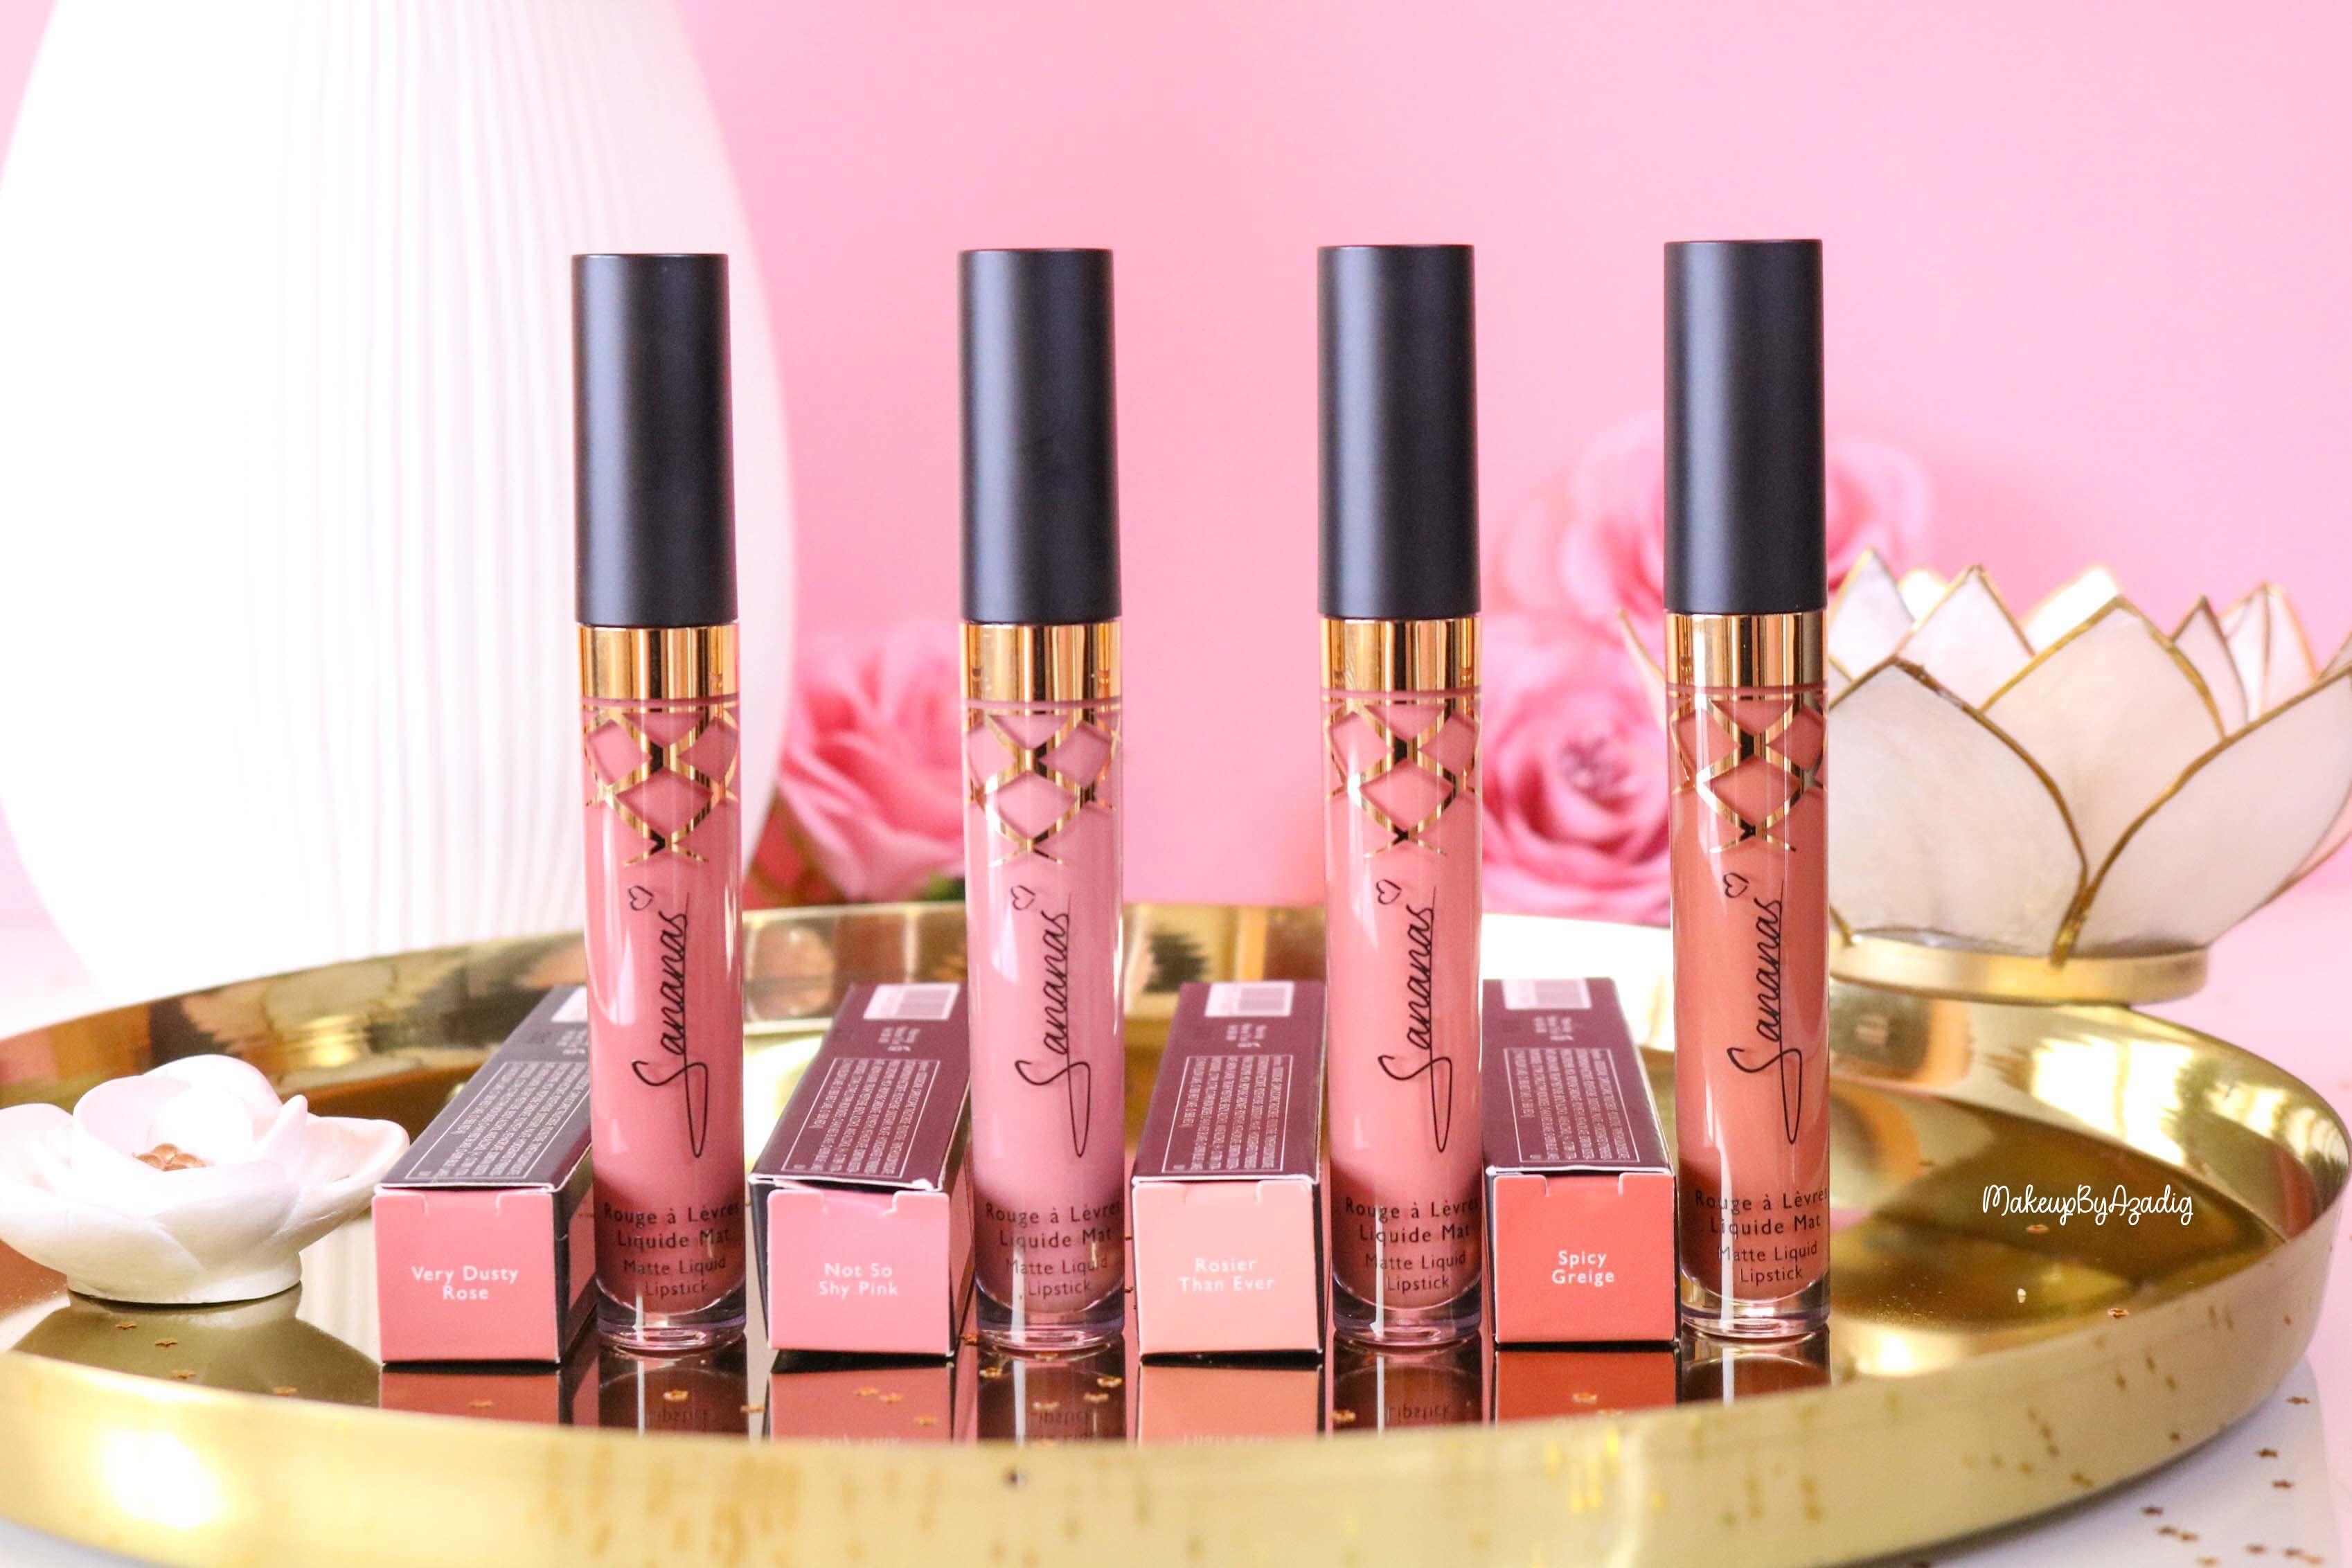 revue-marque-sananas-beauty-rouge-a-levres-vernis-kit-avis-prix-amazon-makeupbyazadig-dusty-pink-greige-rosier-miniature